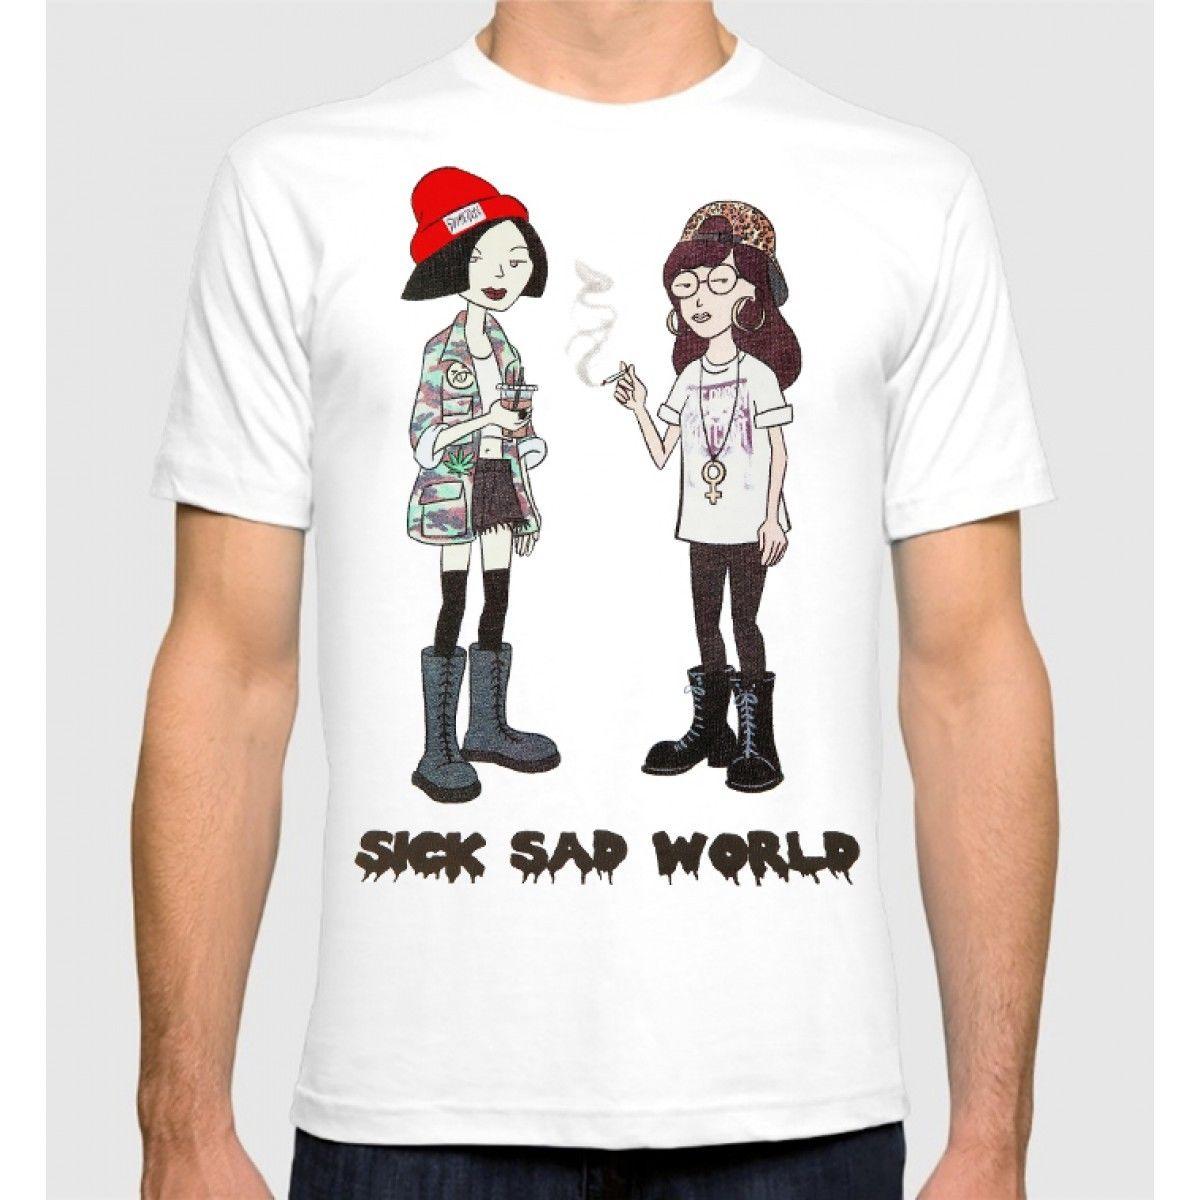 Daria T-shirt Sick Sad World Men Women New Cotton Tee S- Print T Shirts Mens Short Sleeve Hot top